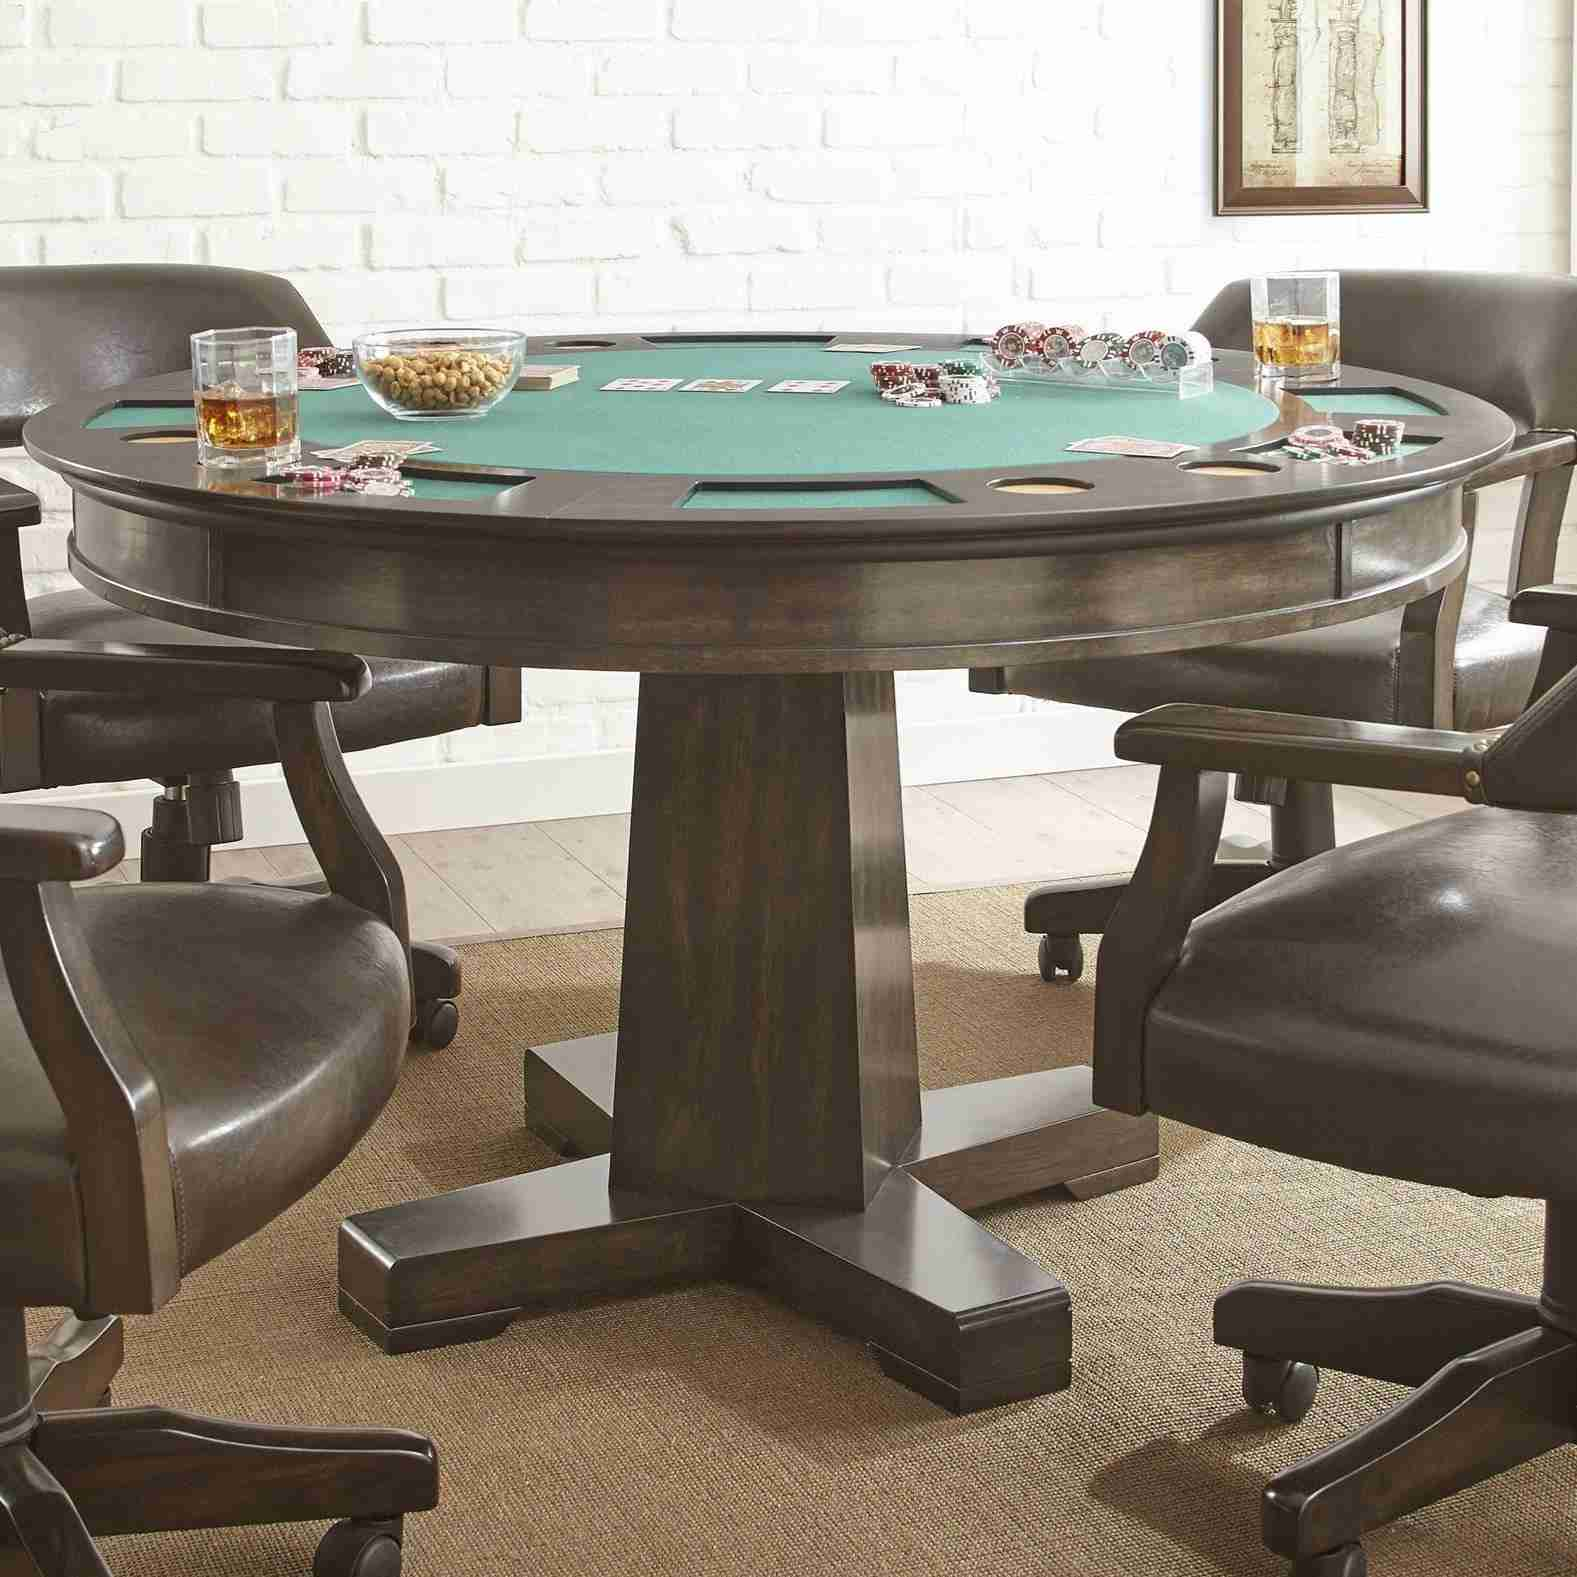 DIY Game Table Plans